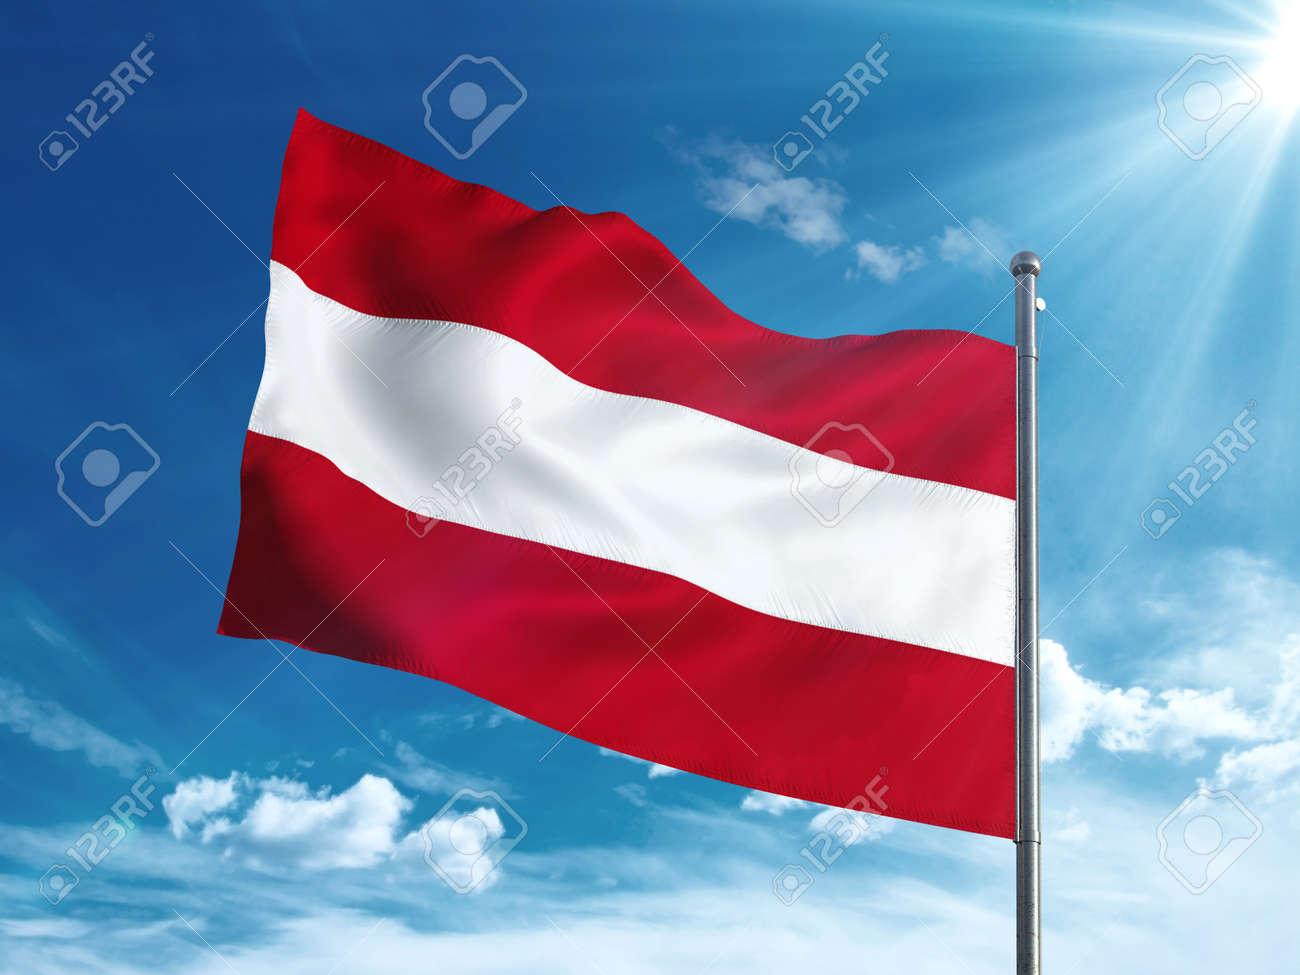 Austria flag waving in the blue sky - 82807969